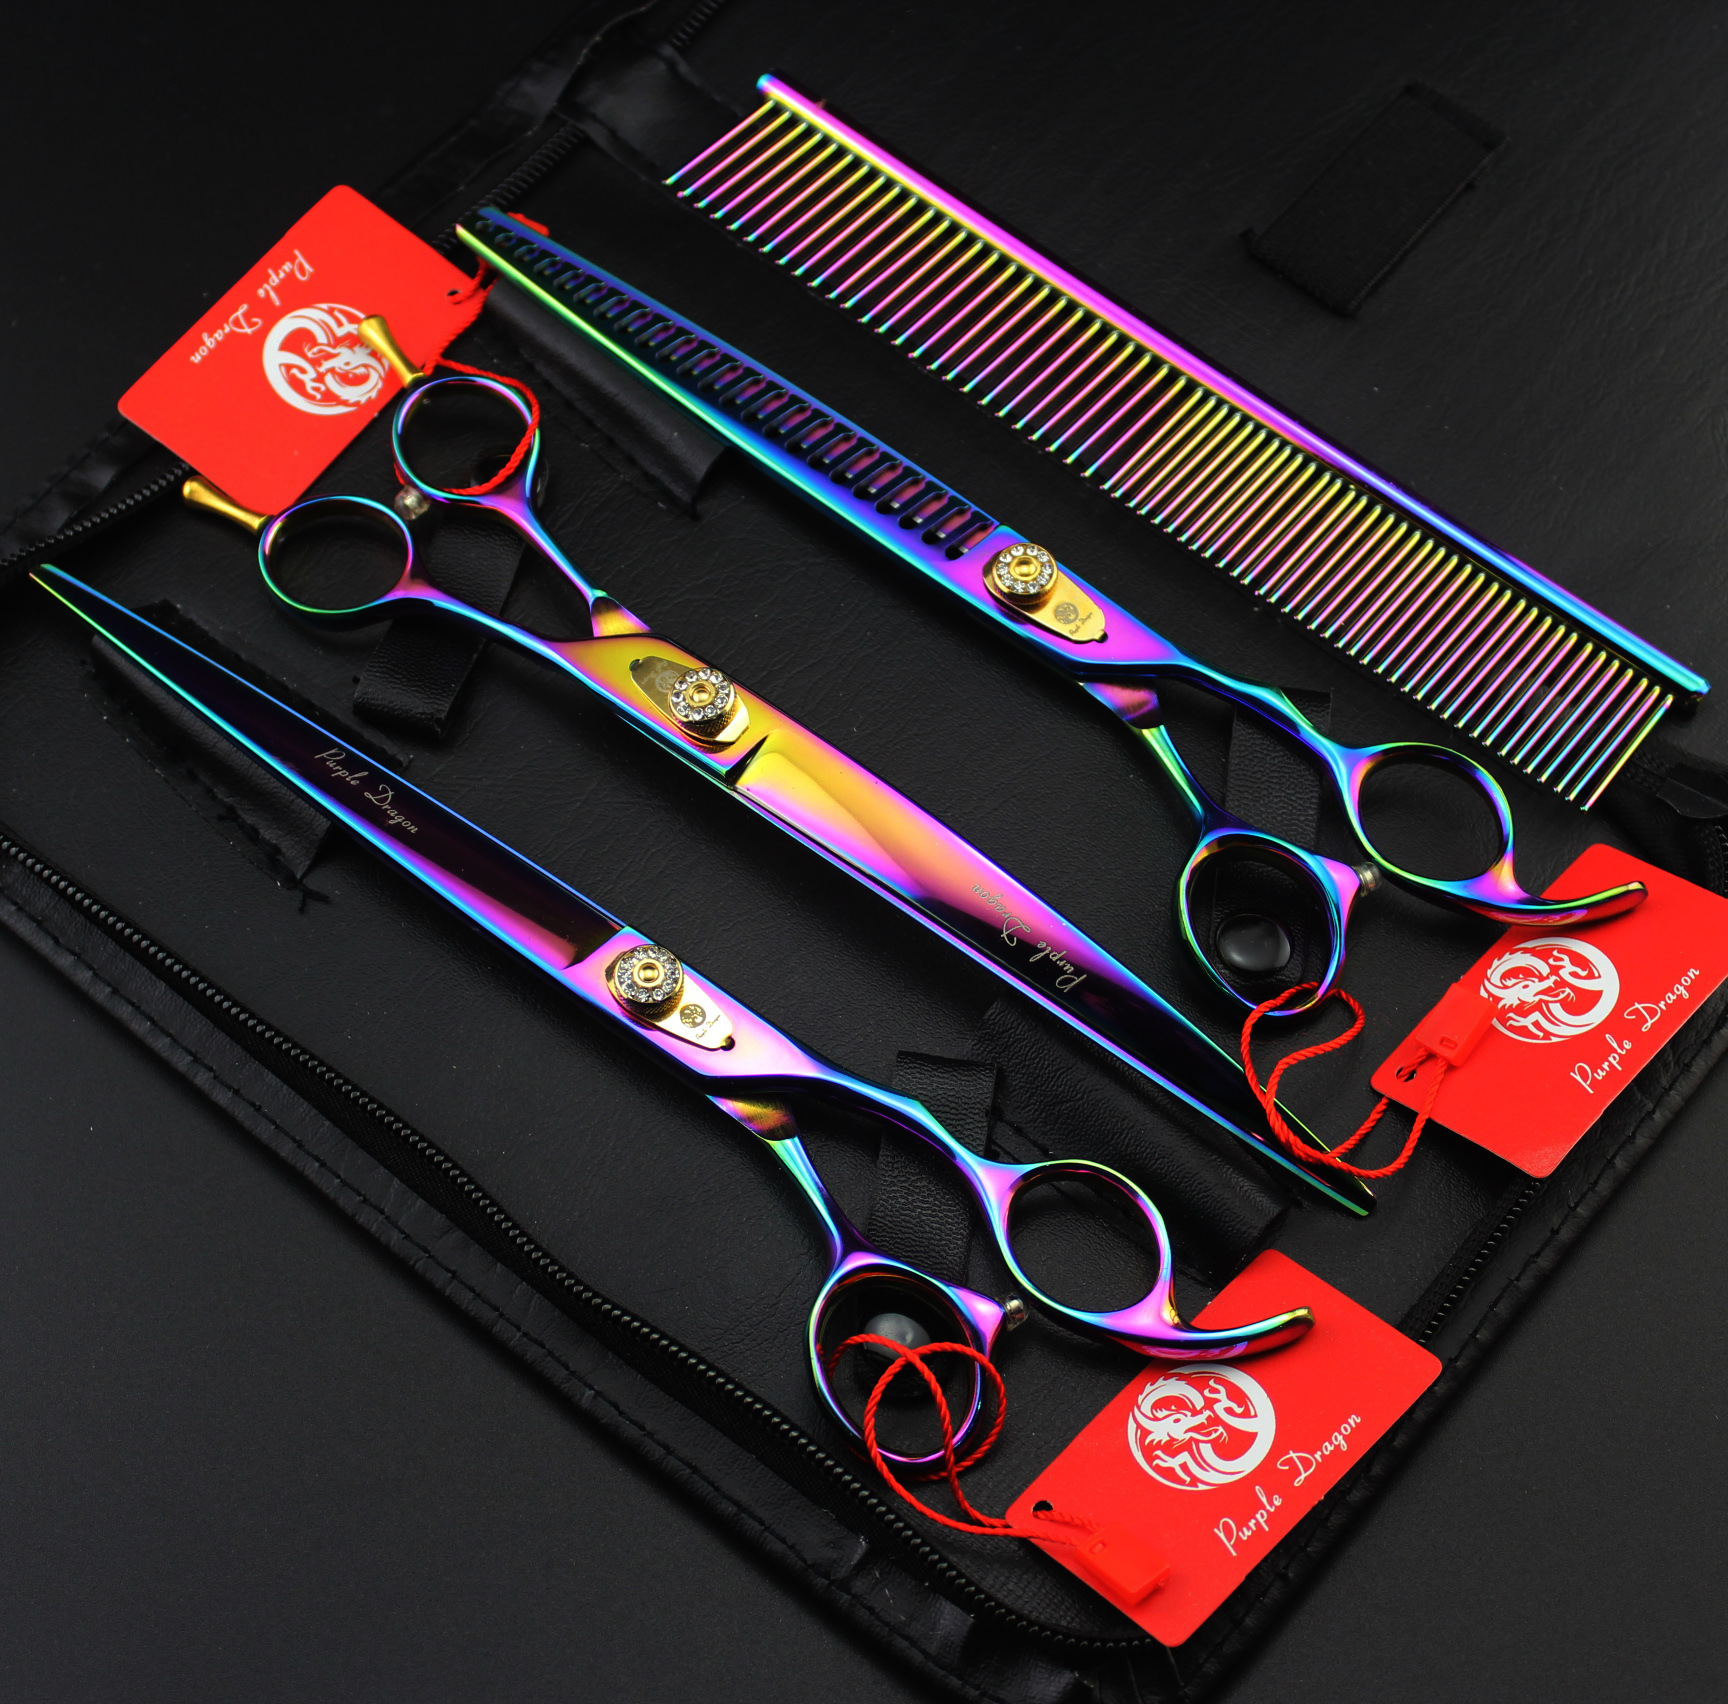 Purple Dragon 8 INCH Rainbow Professional Pet scissors sets,JP440C,62HRC,Straight &amp; Thinning &amp; Curved scissors sets 3PCS/package<br><br>Aliexpress